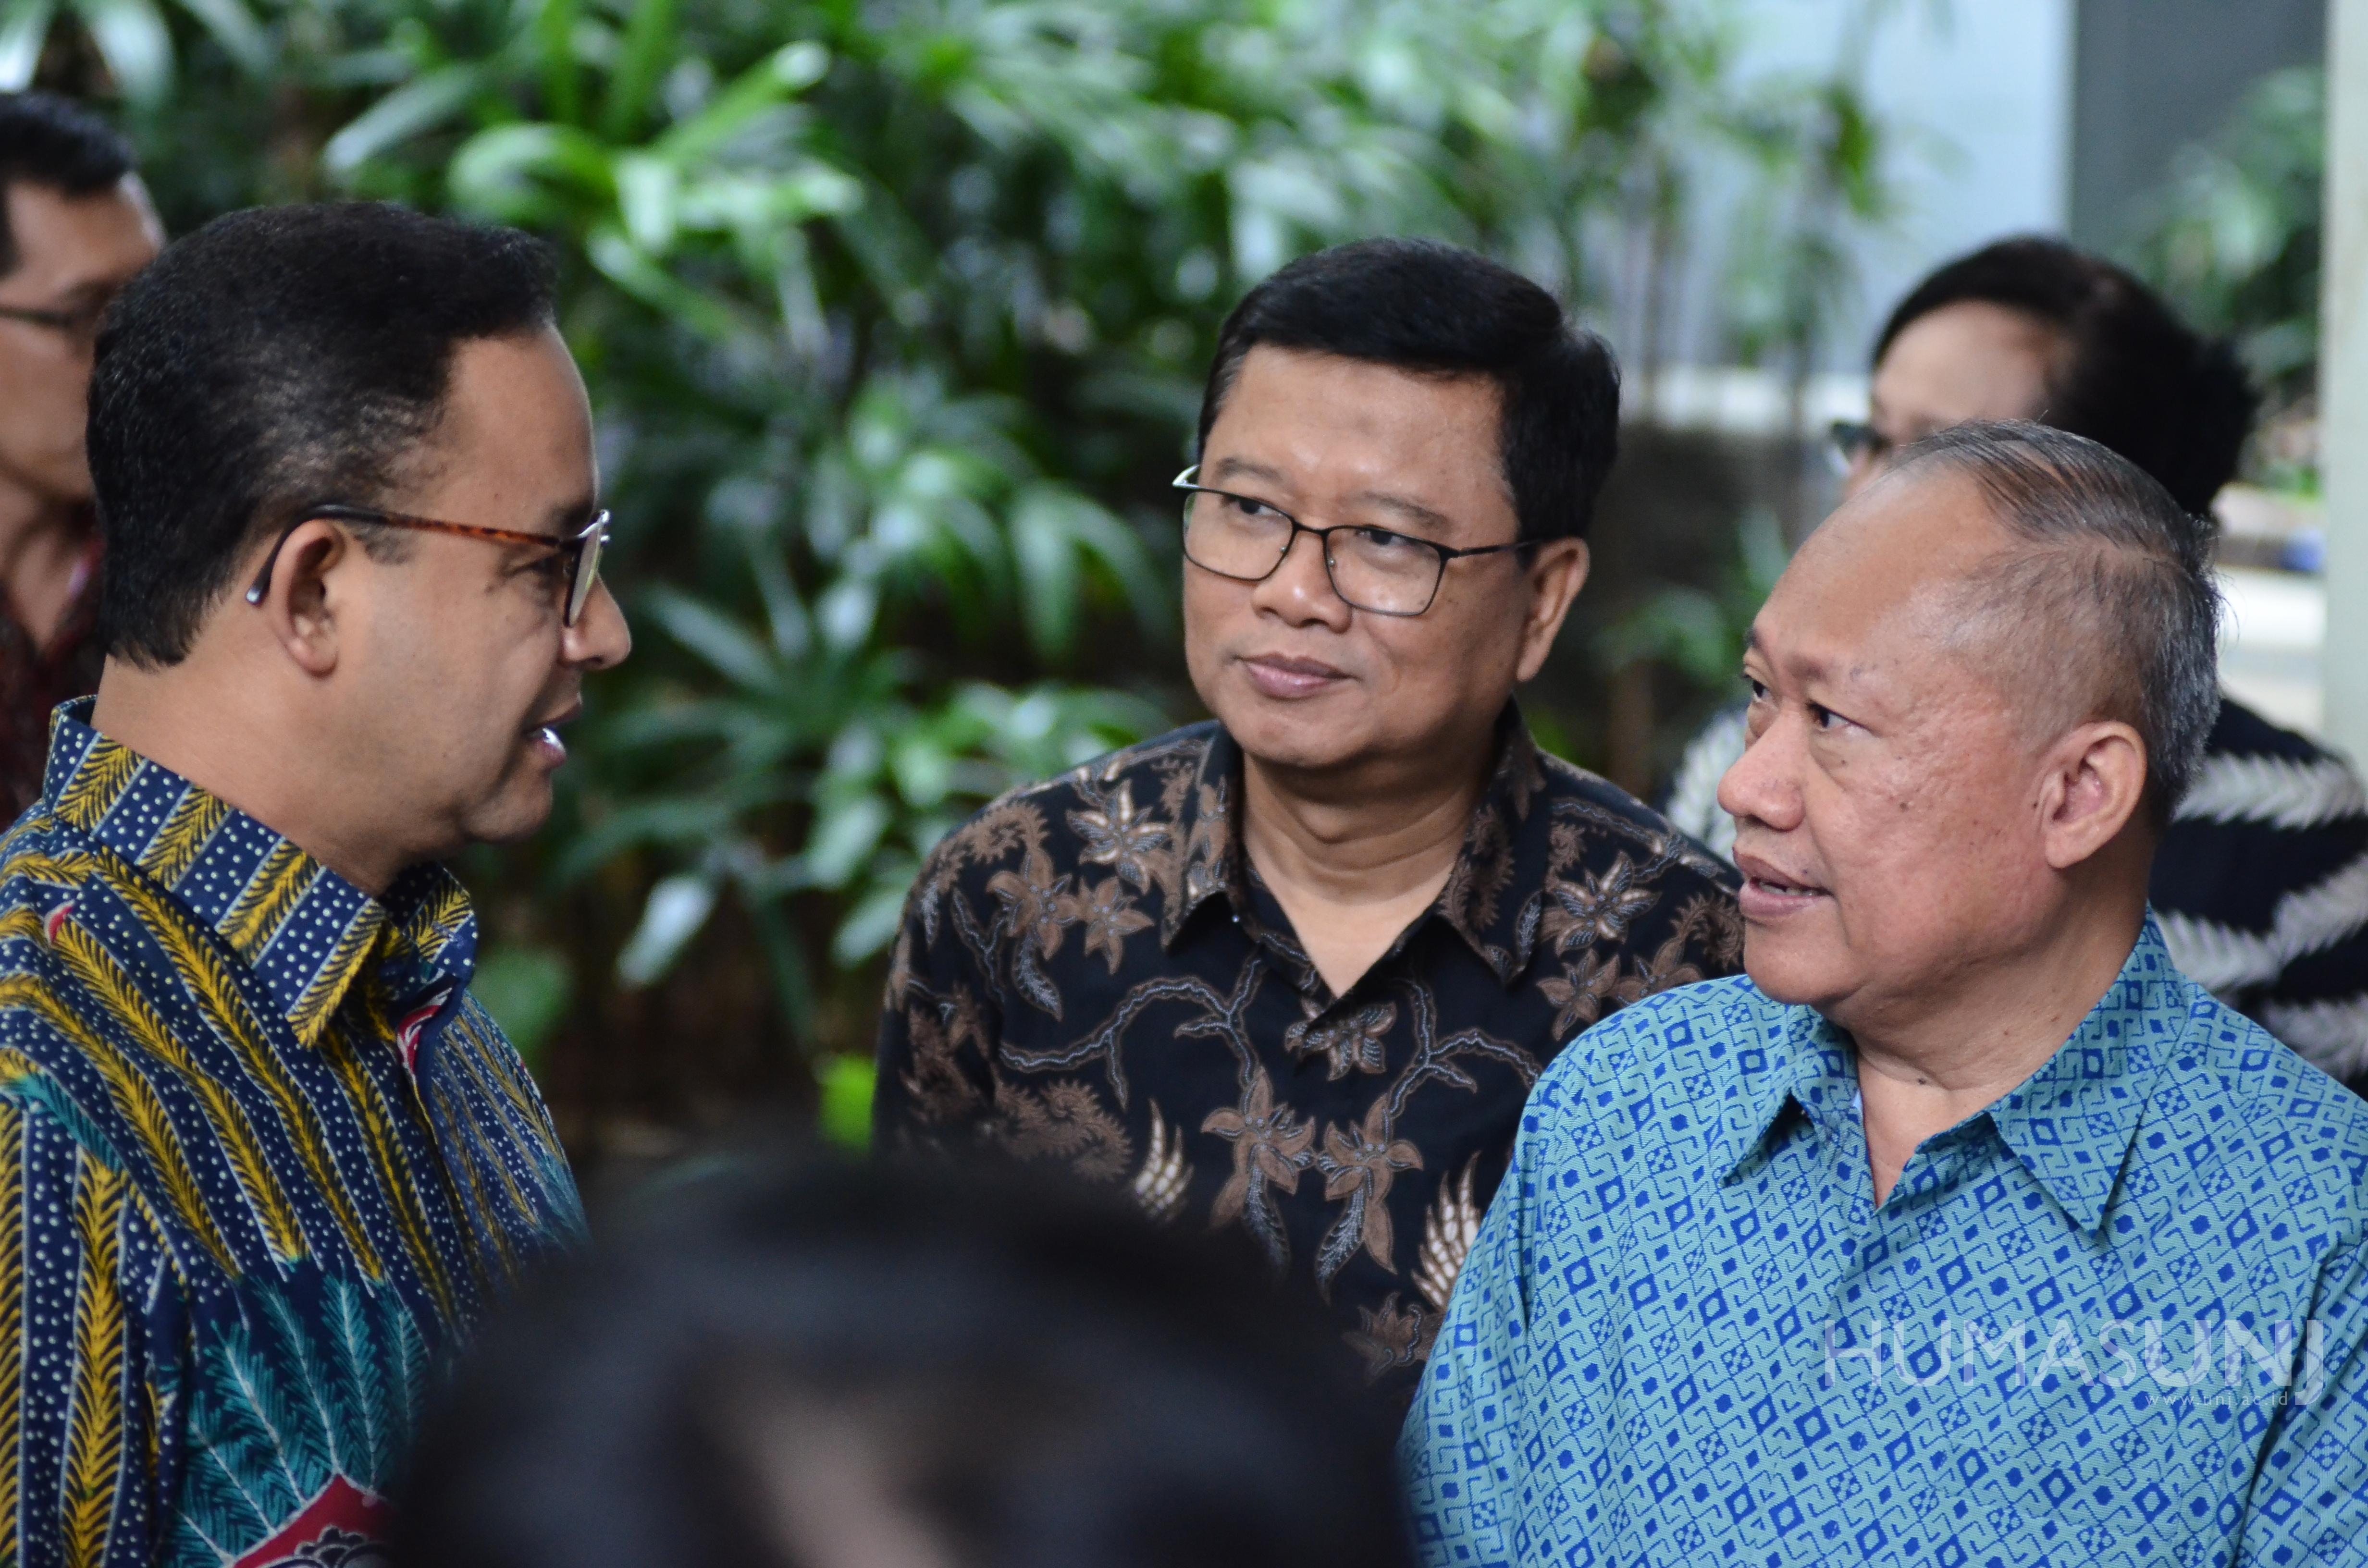 (Bahasa) Penghargaan Partisipasi Penanggulangan Kemiskinan di Wilayah Provinsi DKI Jakarta